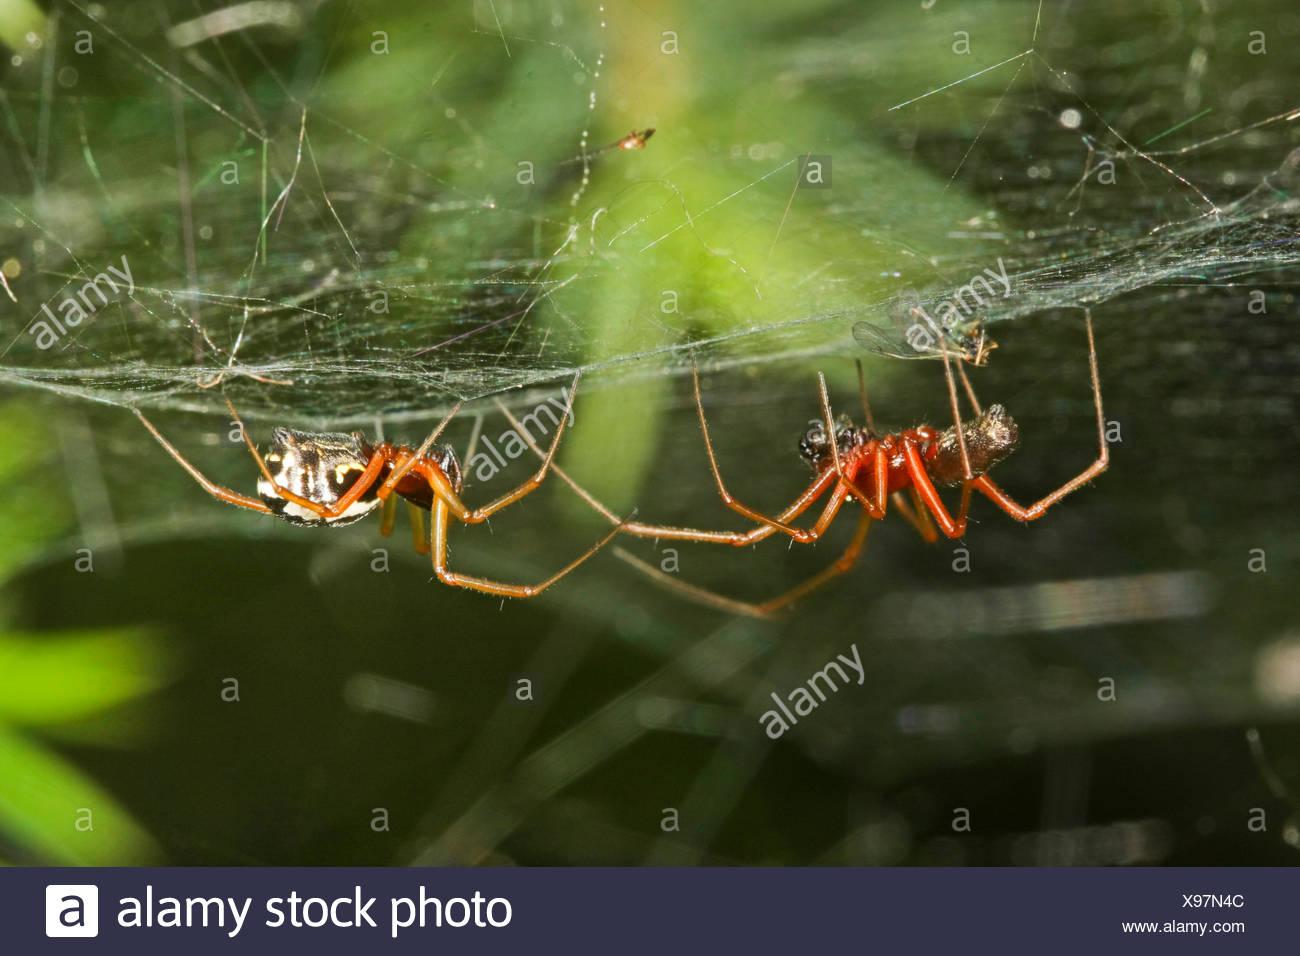 Baldachinspinne, Baldachin-Spinne, Frontinellina frutetorum (Frontinellina frutetorum, Frontinella frutetorum, Linyphia frutetor - Stock Image